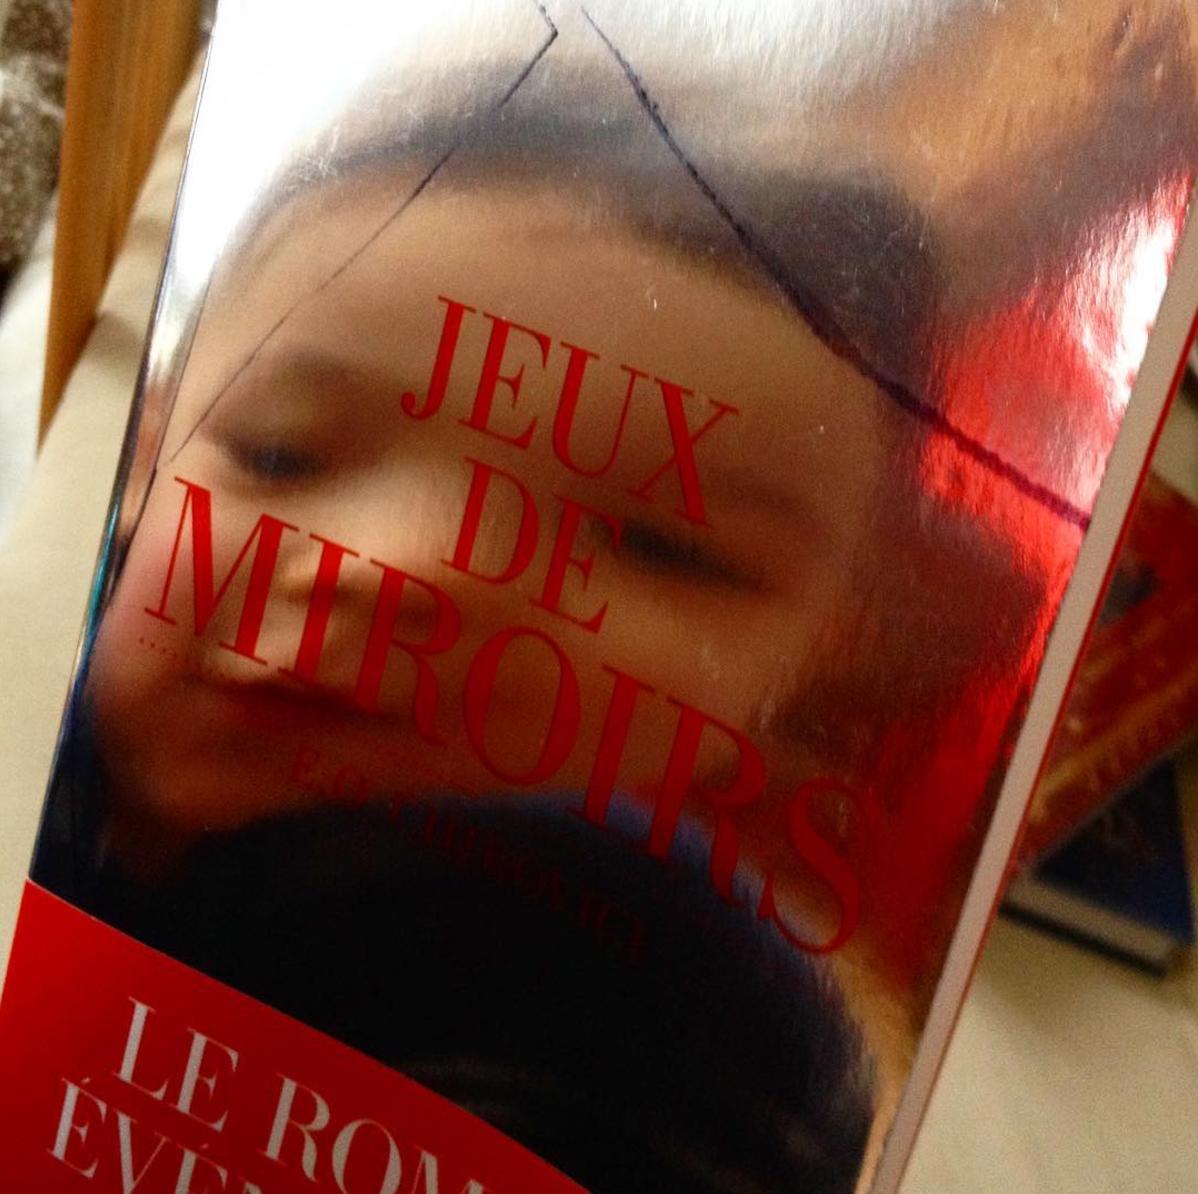 Me darcy and i jeux de miroirs e o chirovici for Meurtre en miroir